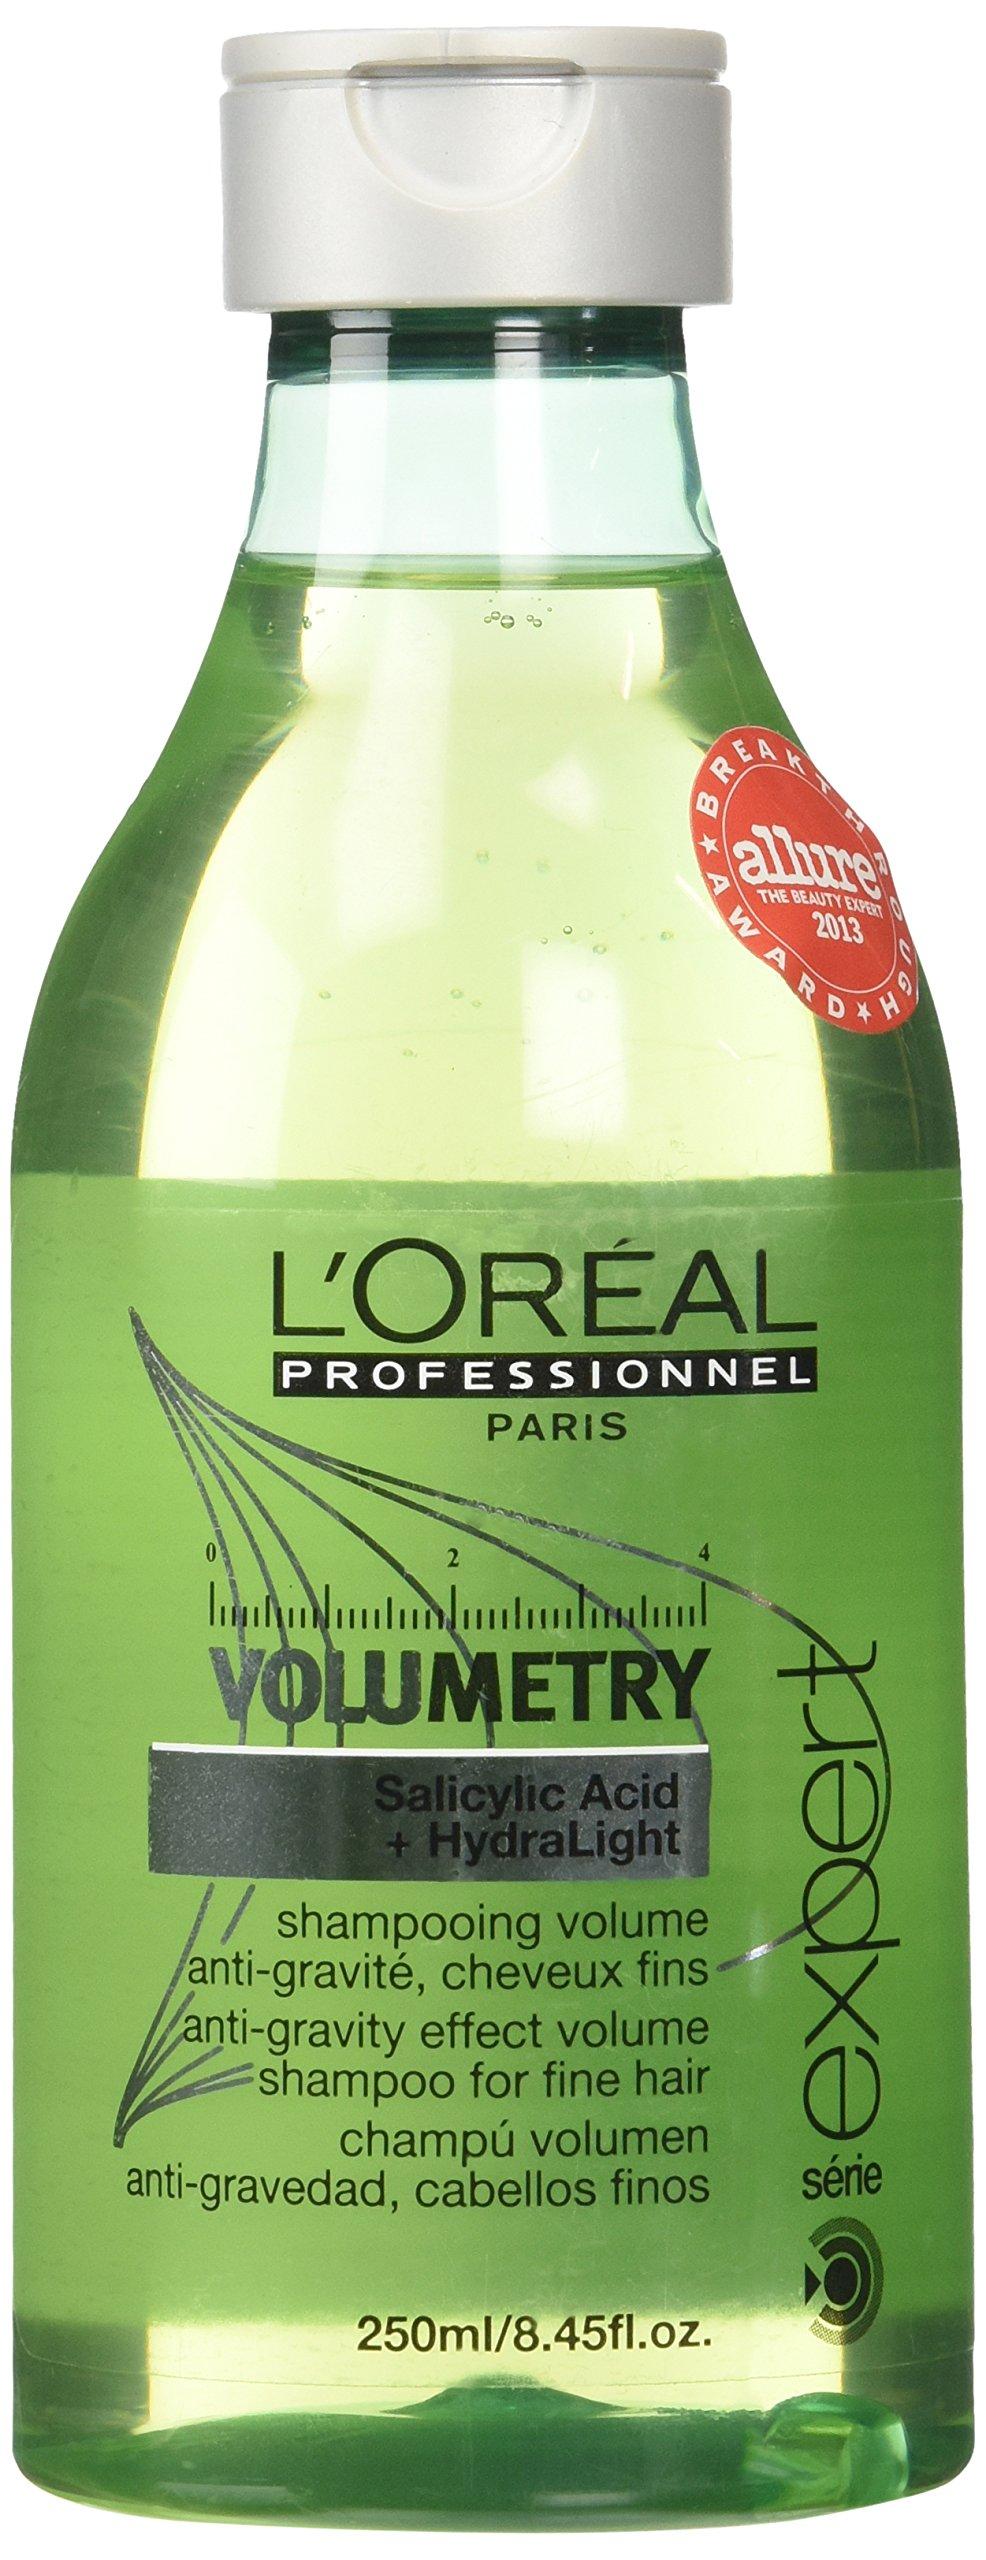 L'Oreal Professional Expert Serie Volumetry Anti Gravity Effect Volume Shampoo, 8.45 Ounce